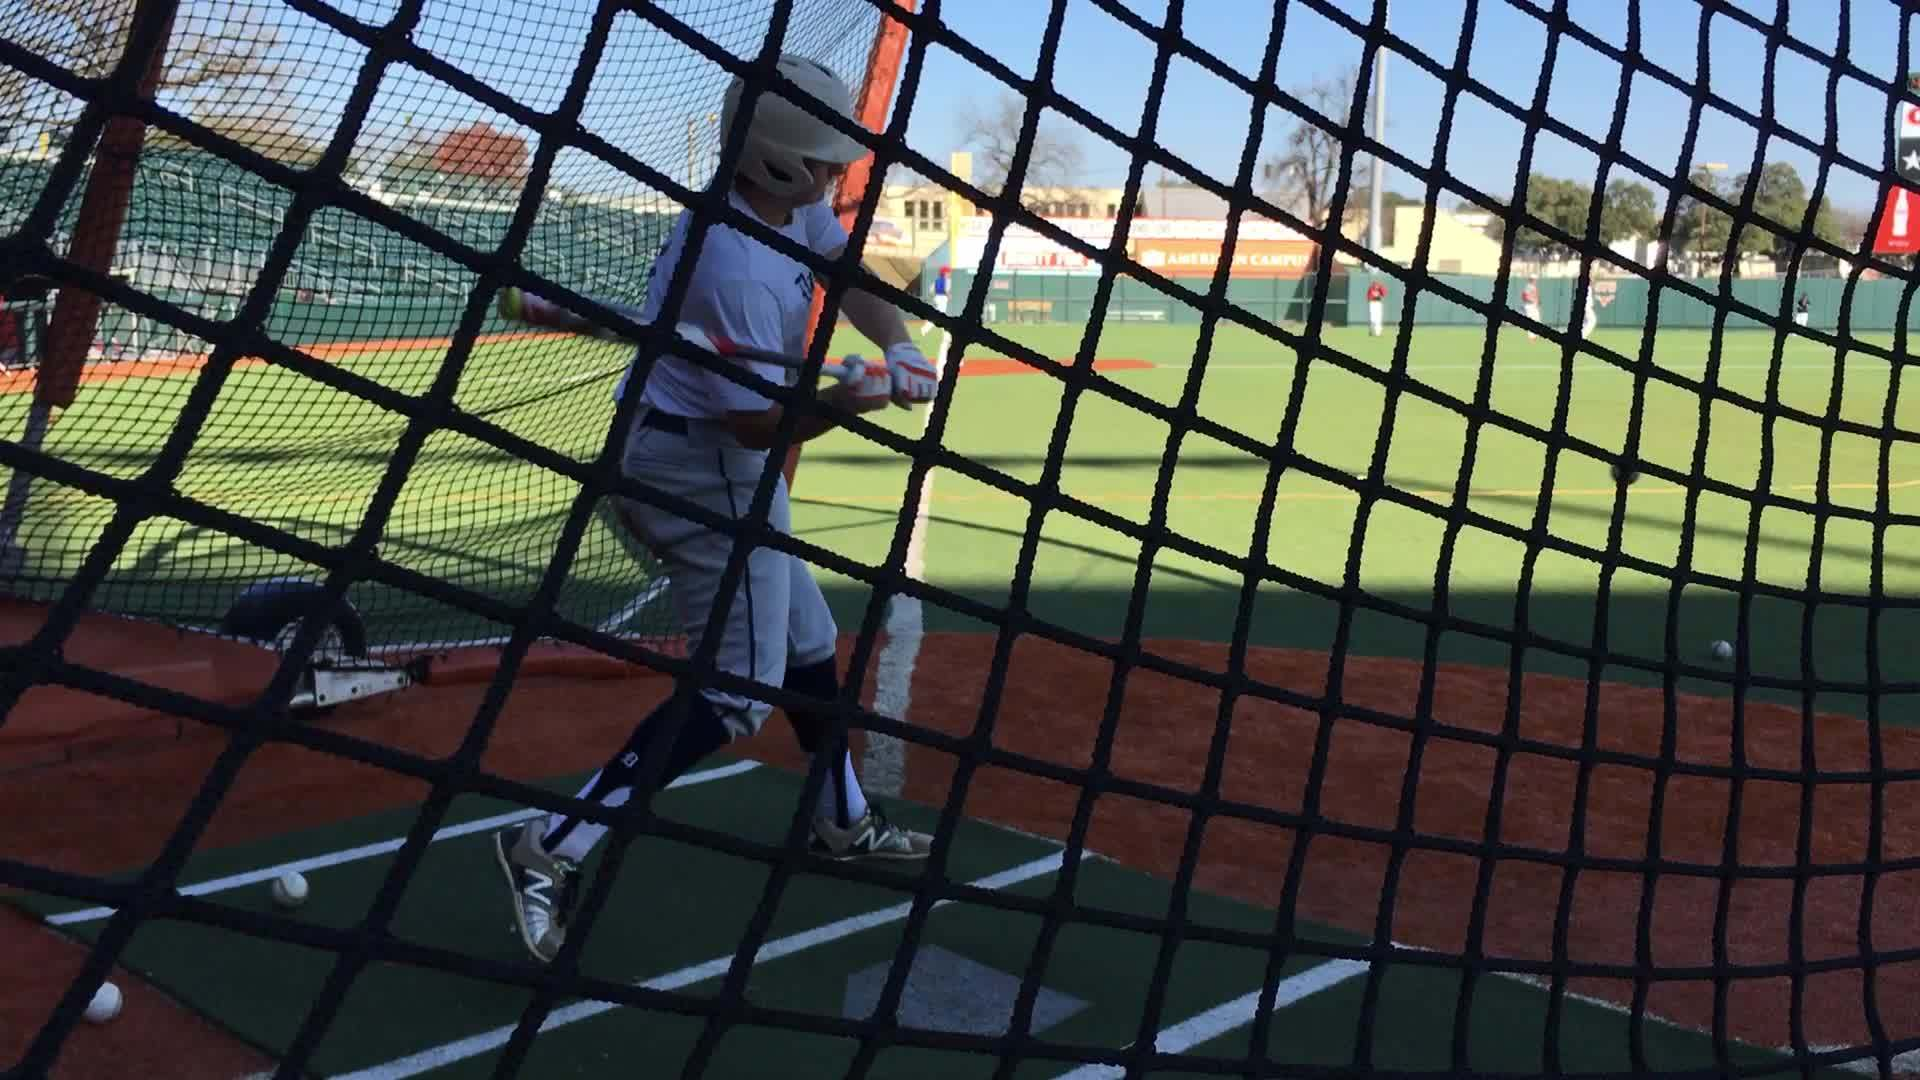 baseballgifs, photography, Justin Childers Rockwall High School Class of 2018 GIFs